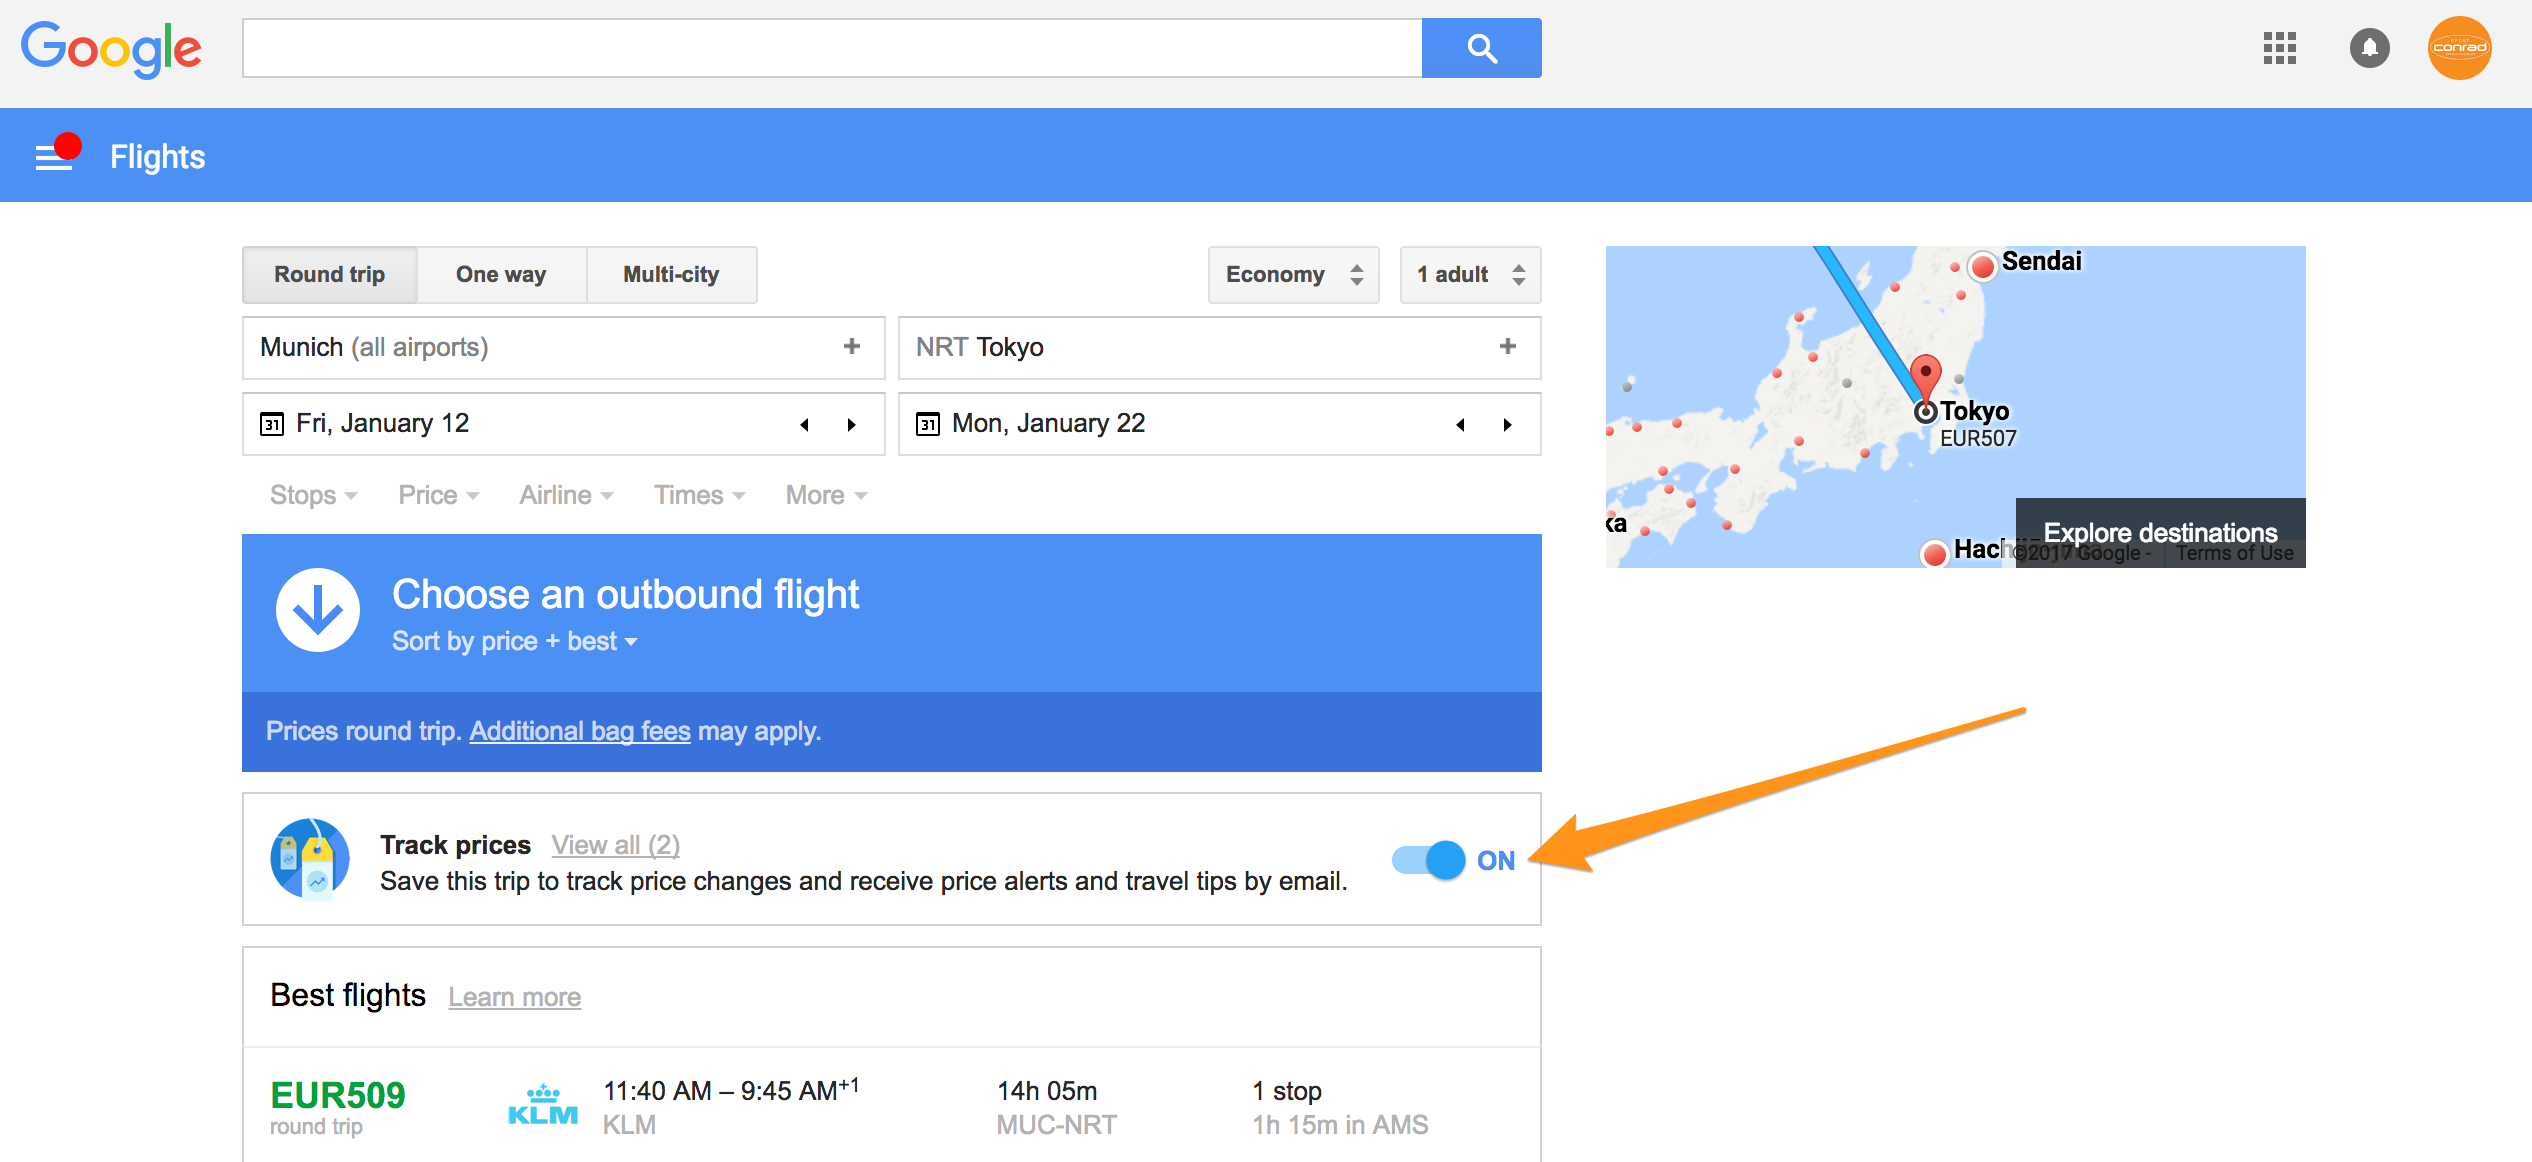 japan-ski-trip-google-flights-price-alert